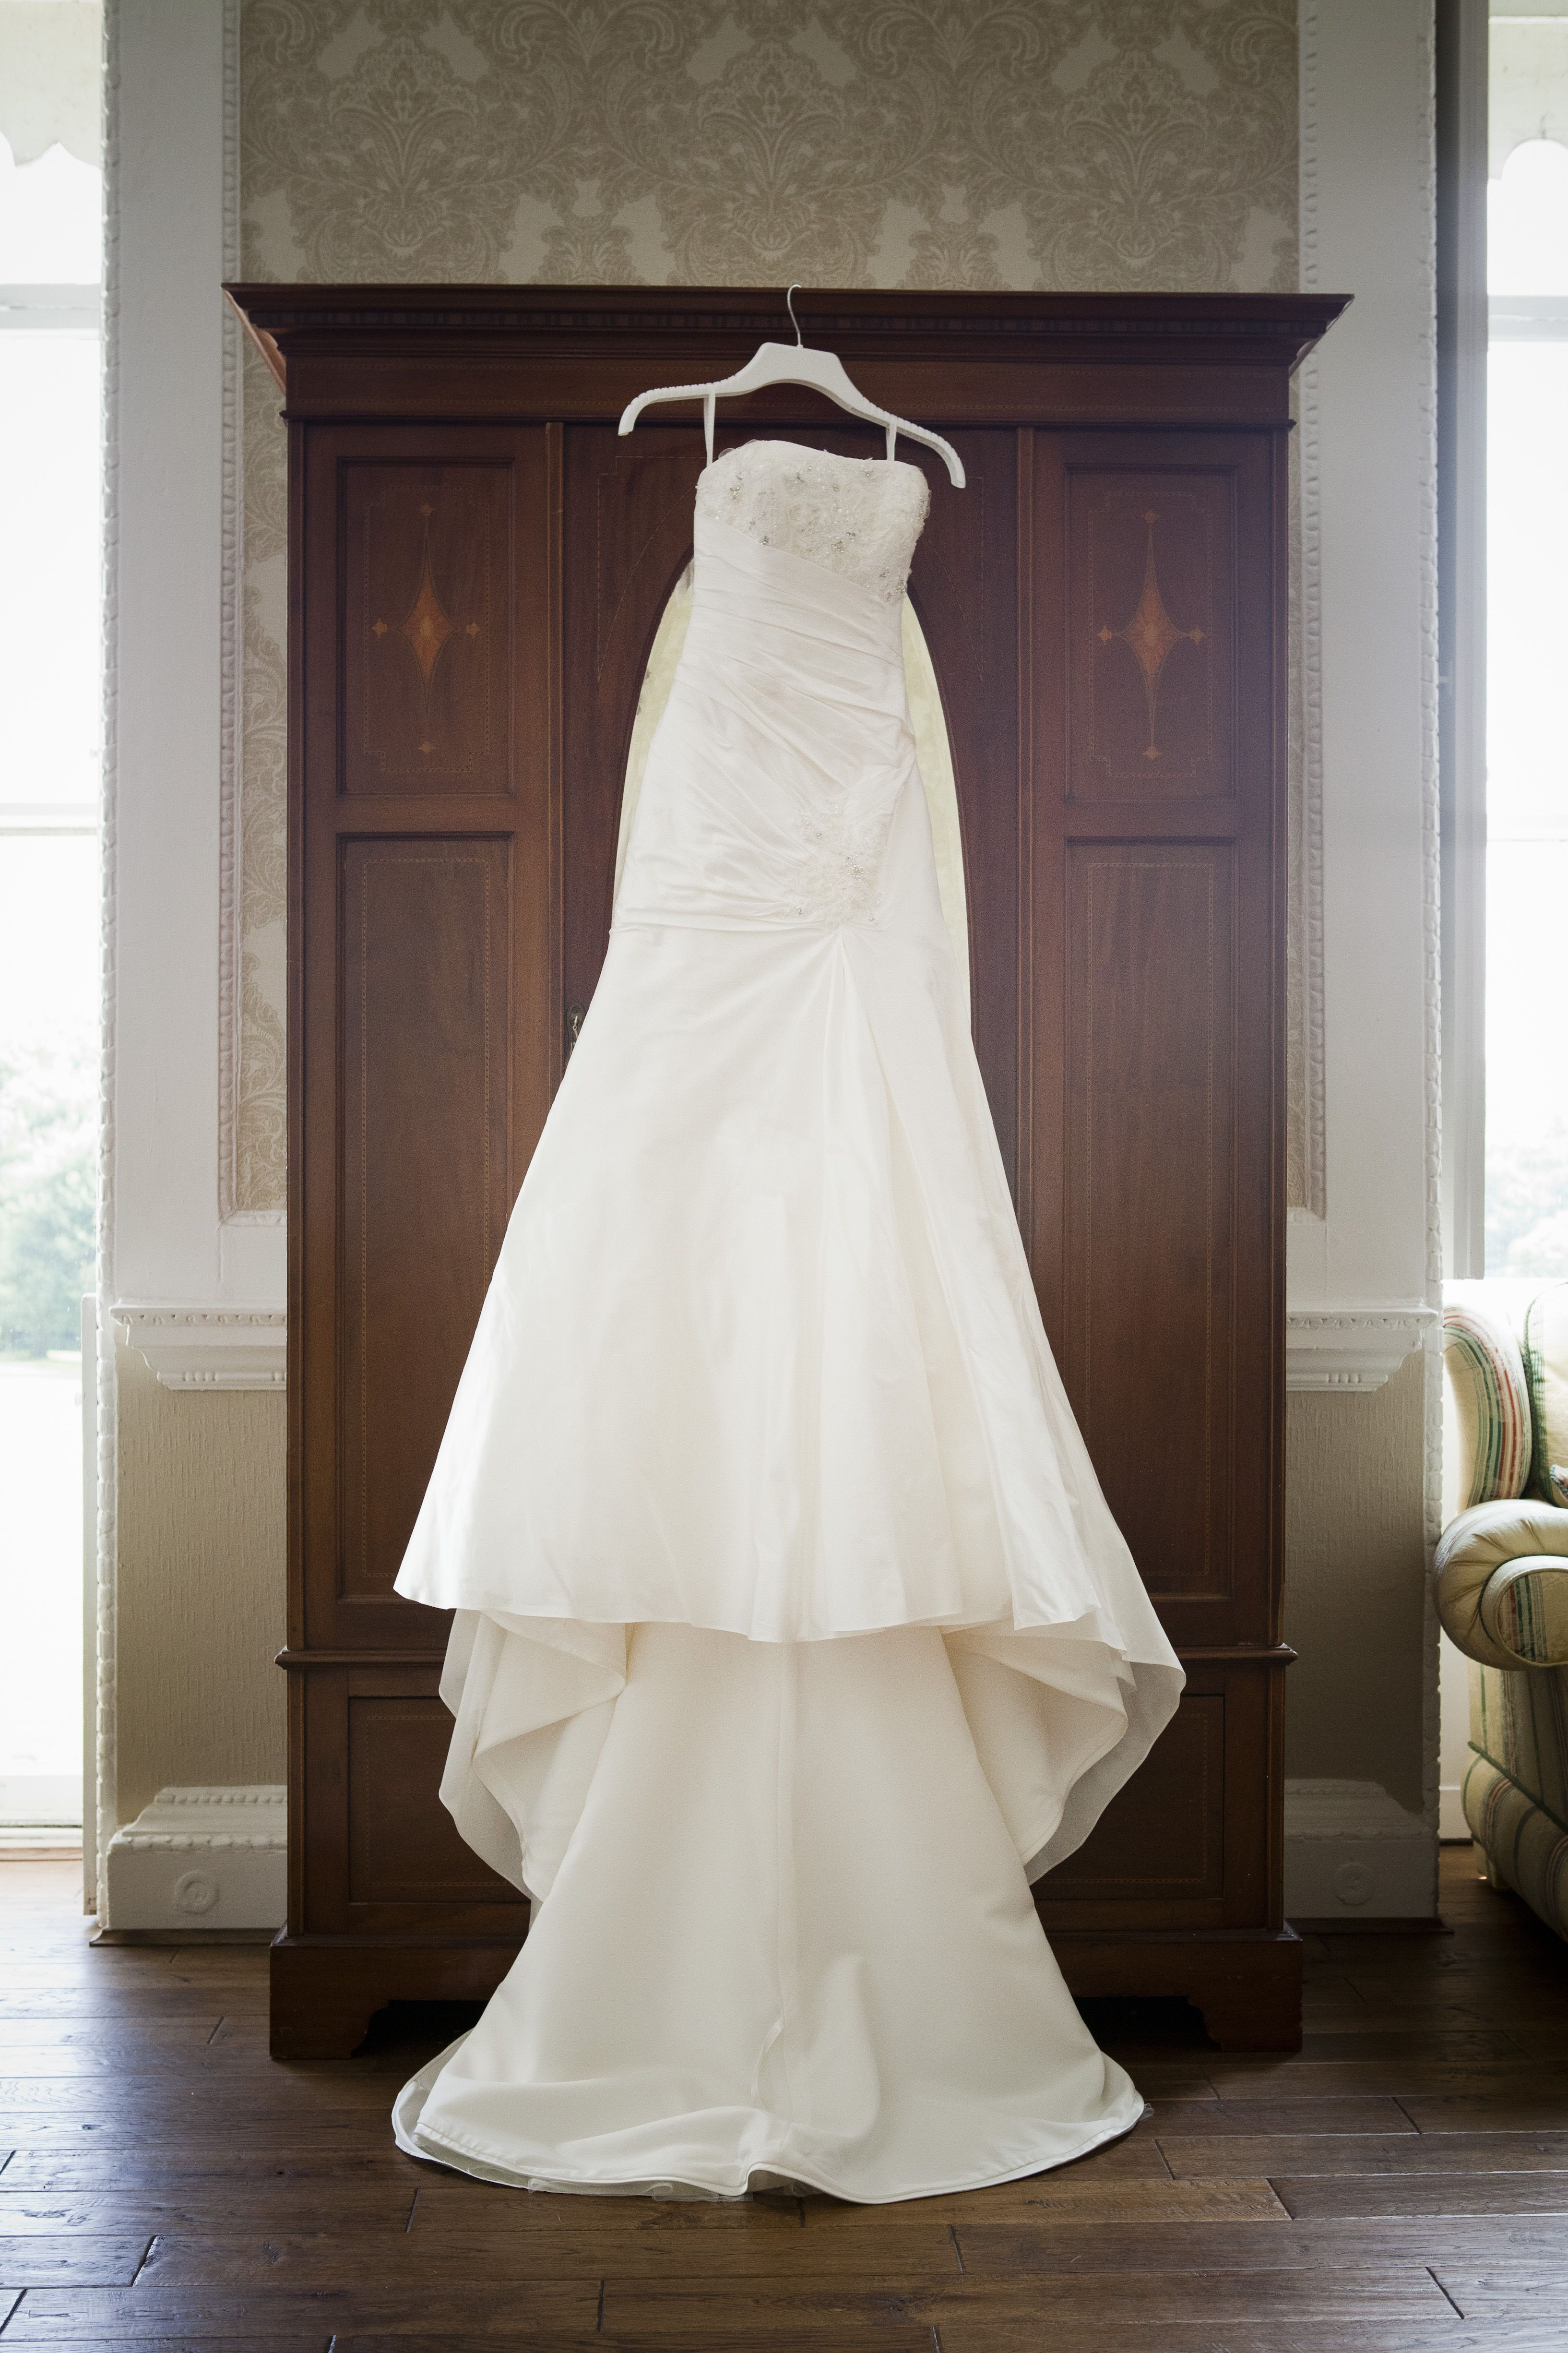 Wedding Dress Hanging Up With Wardrobe